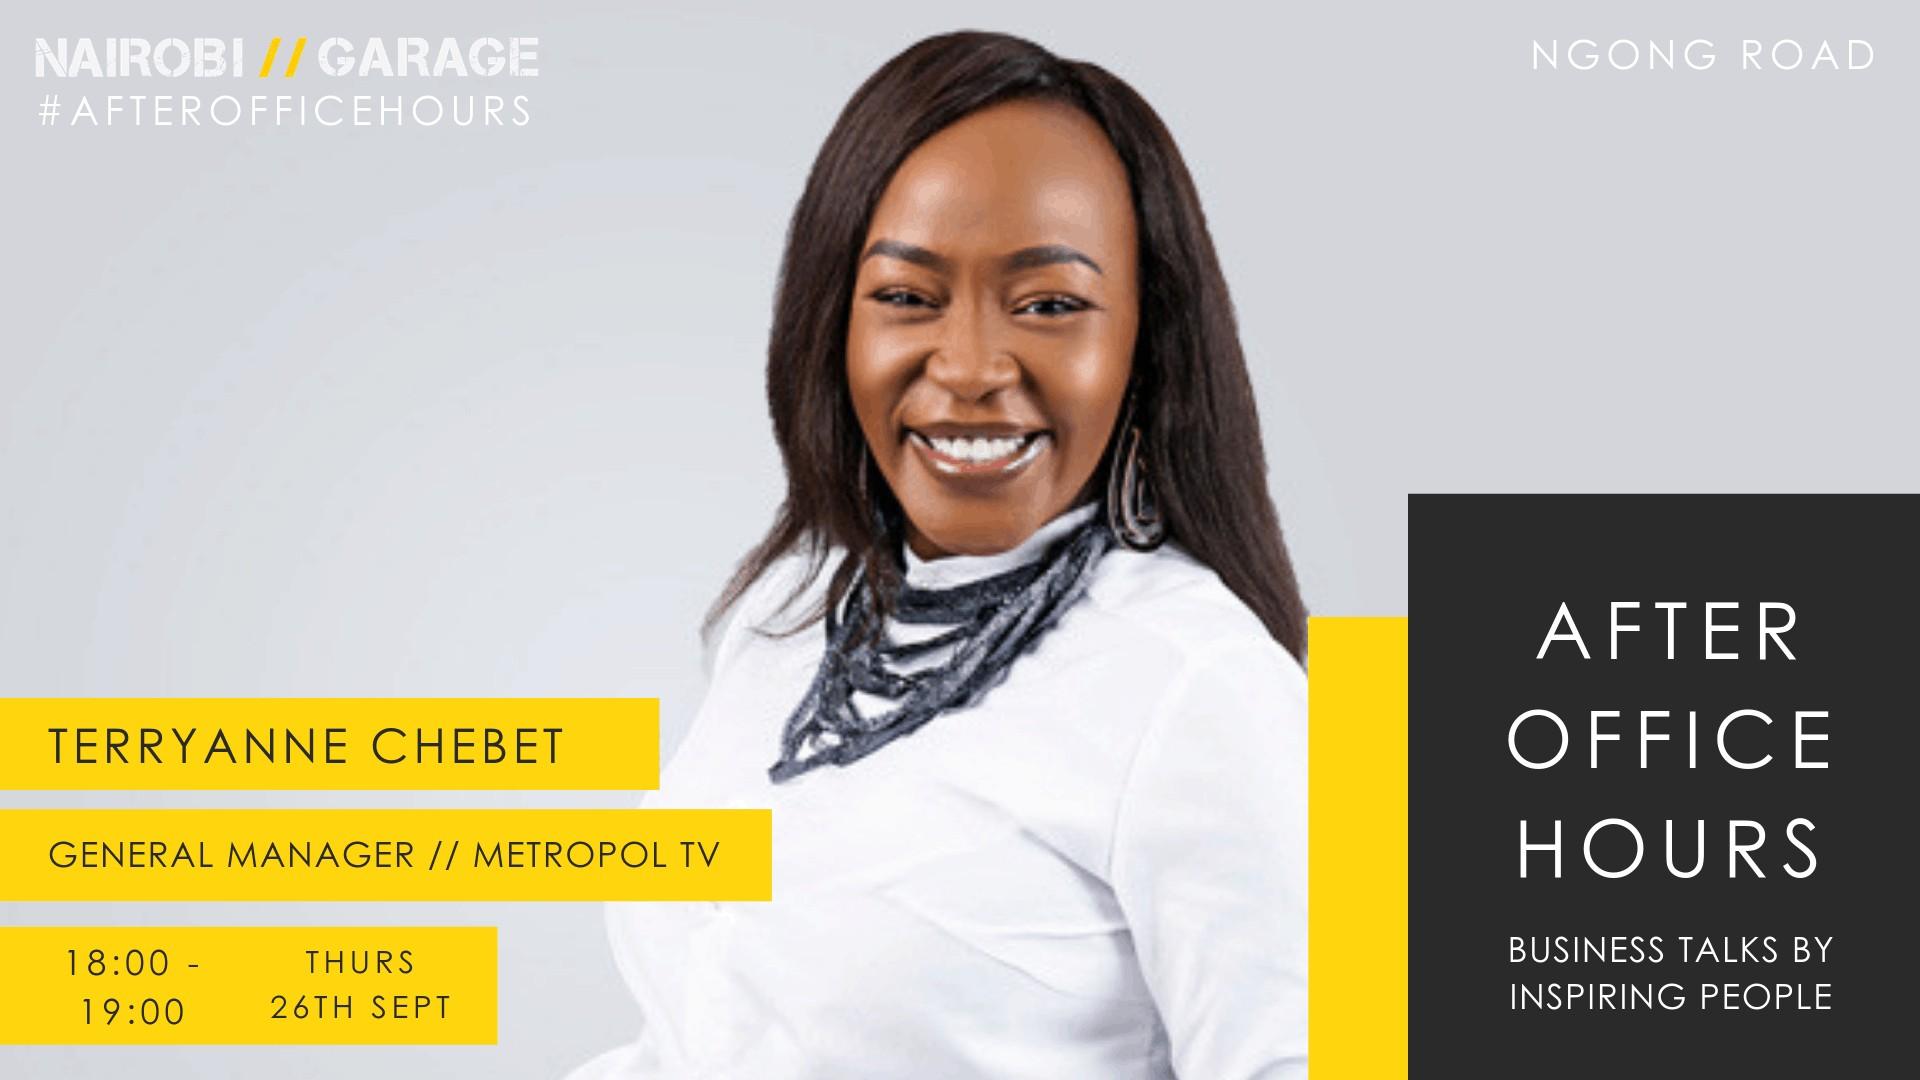 Upcoming events in Nairobi